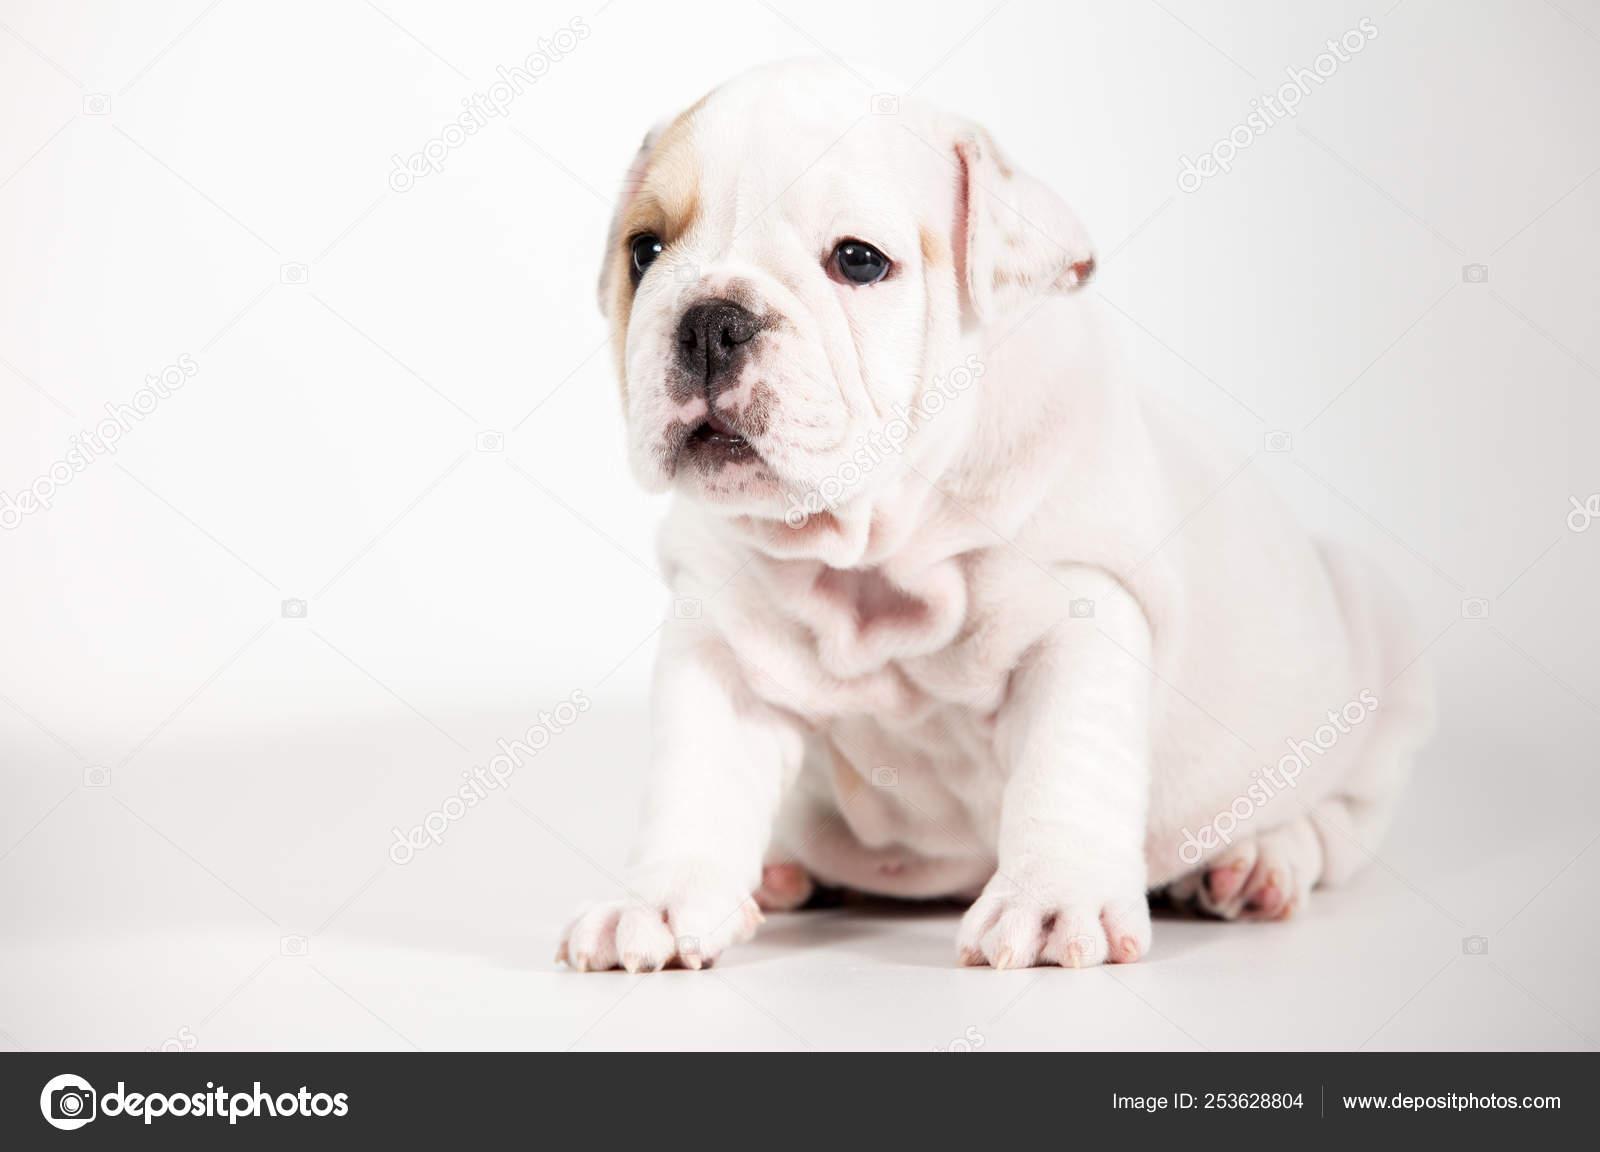 English Bulldog Puppy White Background Stock Photo C Anpet2000 253628804